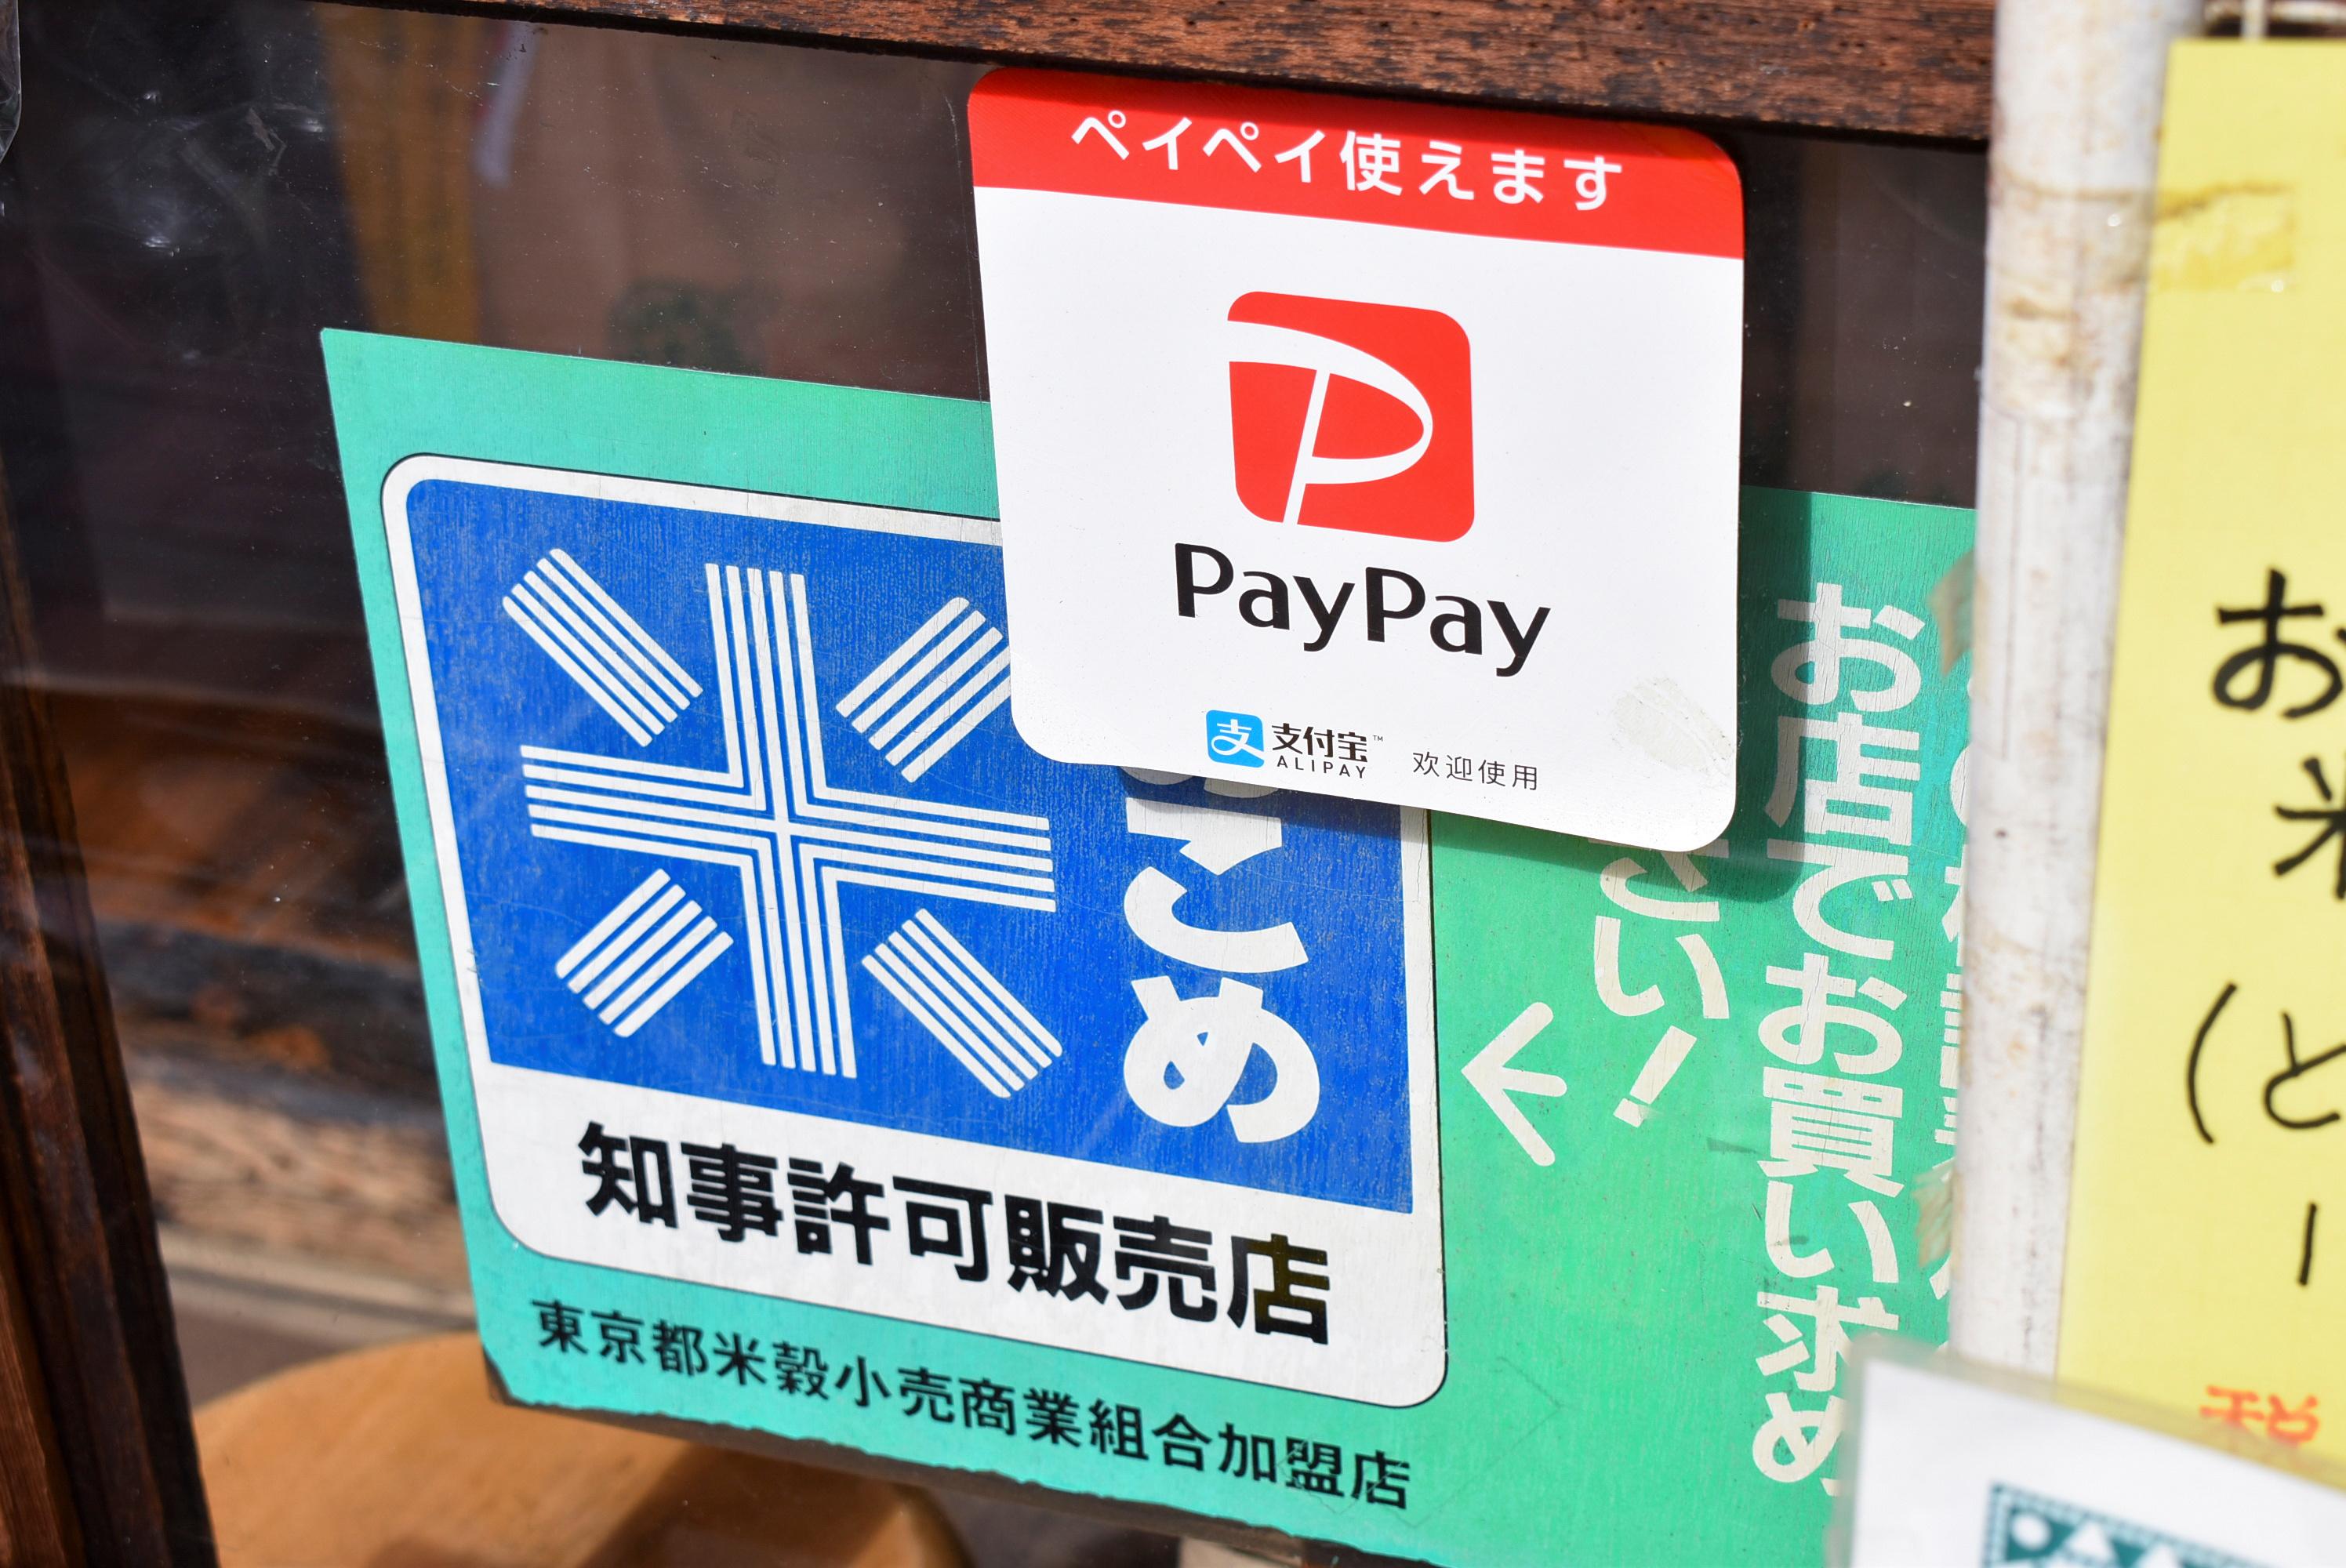 The PayPay app logo is displayed at the rice dealer's shop Mikawaya, in Tokyo, Japan June 7, 2021. Picture taken June 7, 2021. REUTERS/Sam Nussey